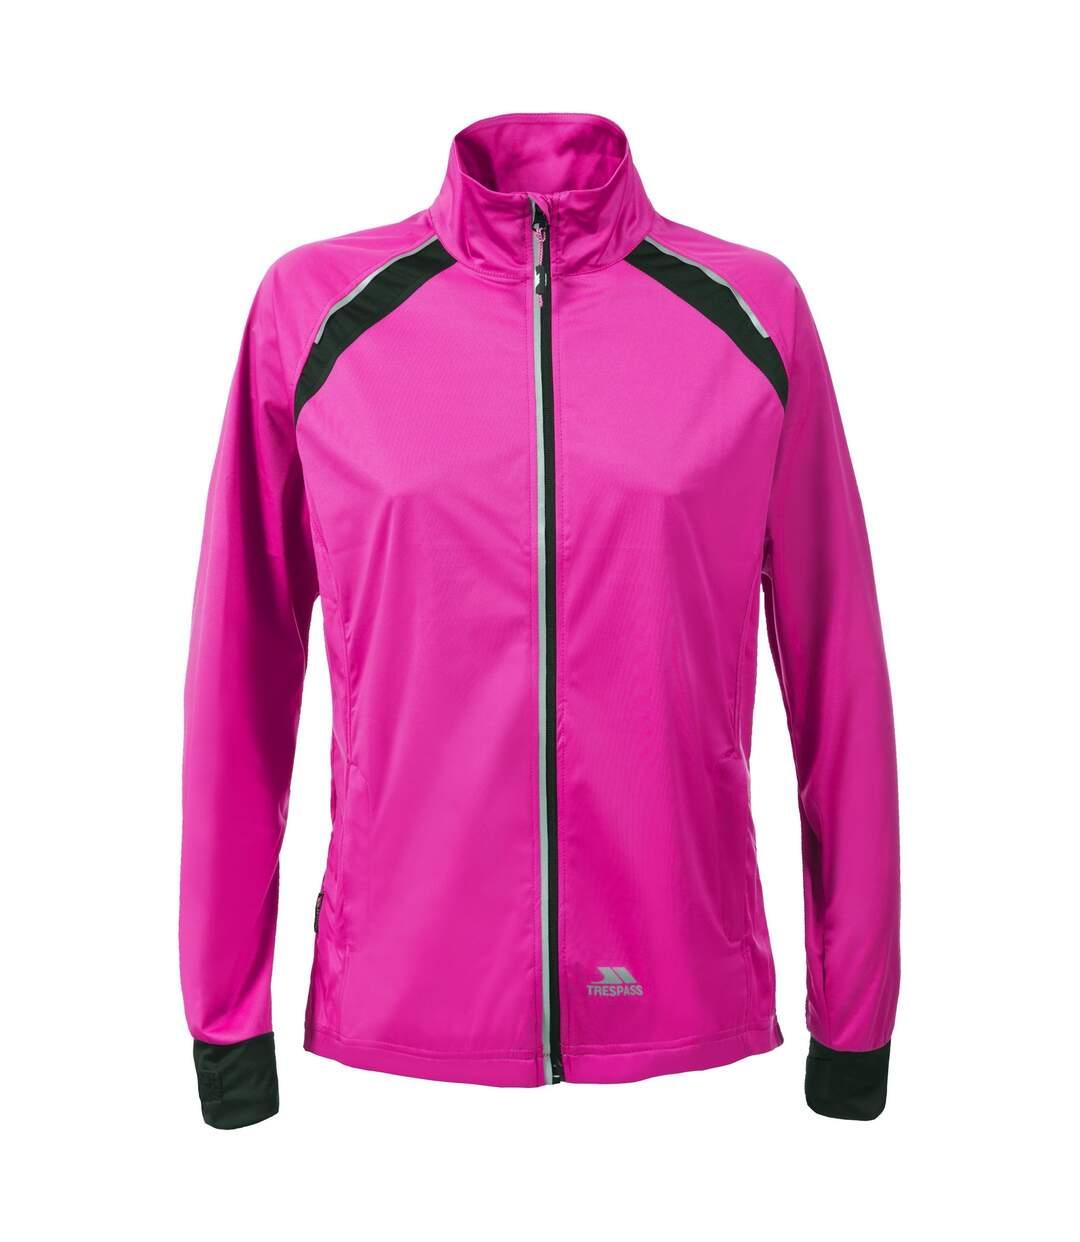 Trespass Womens/Ladies Covered Waterproof Shell Jacket (Pink Glow) - UTTP3439